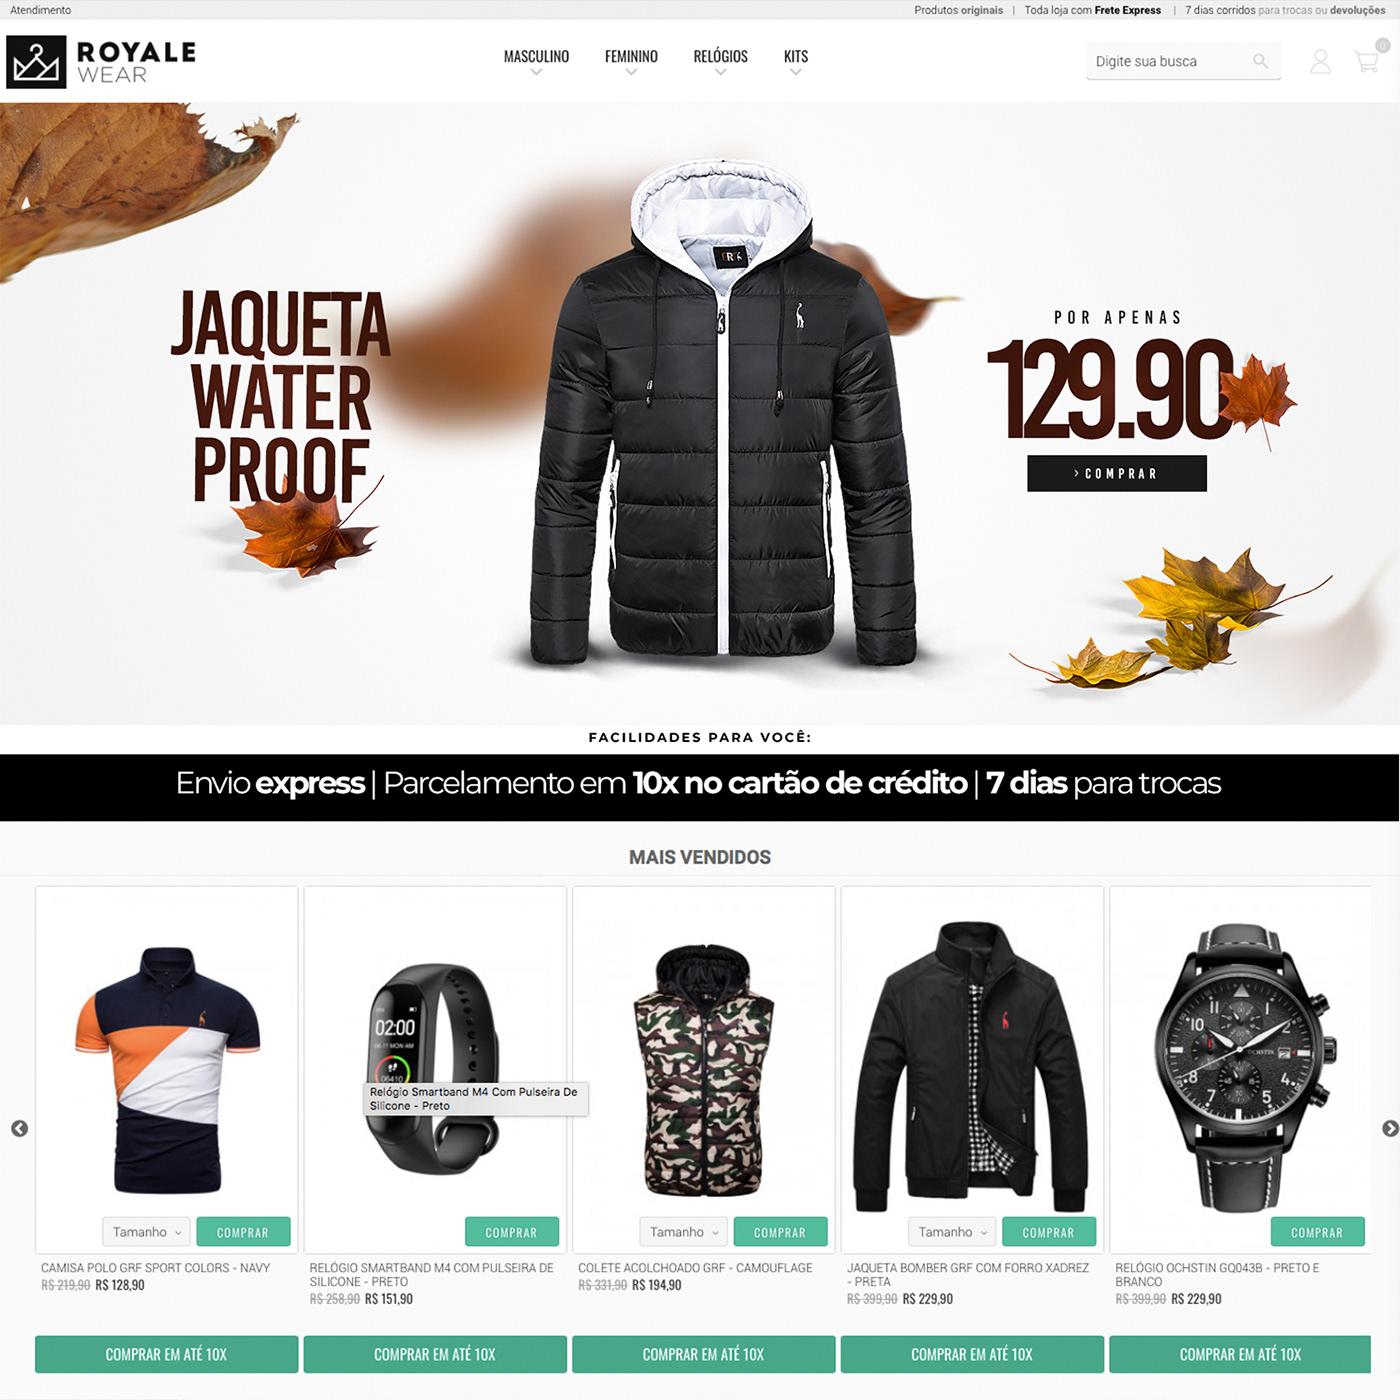 banners Capa design gráfico e-commerce Ecommerce home home page Loja Virtual photoshop royalewear